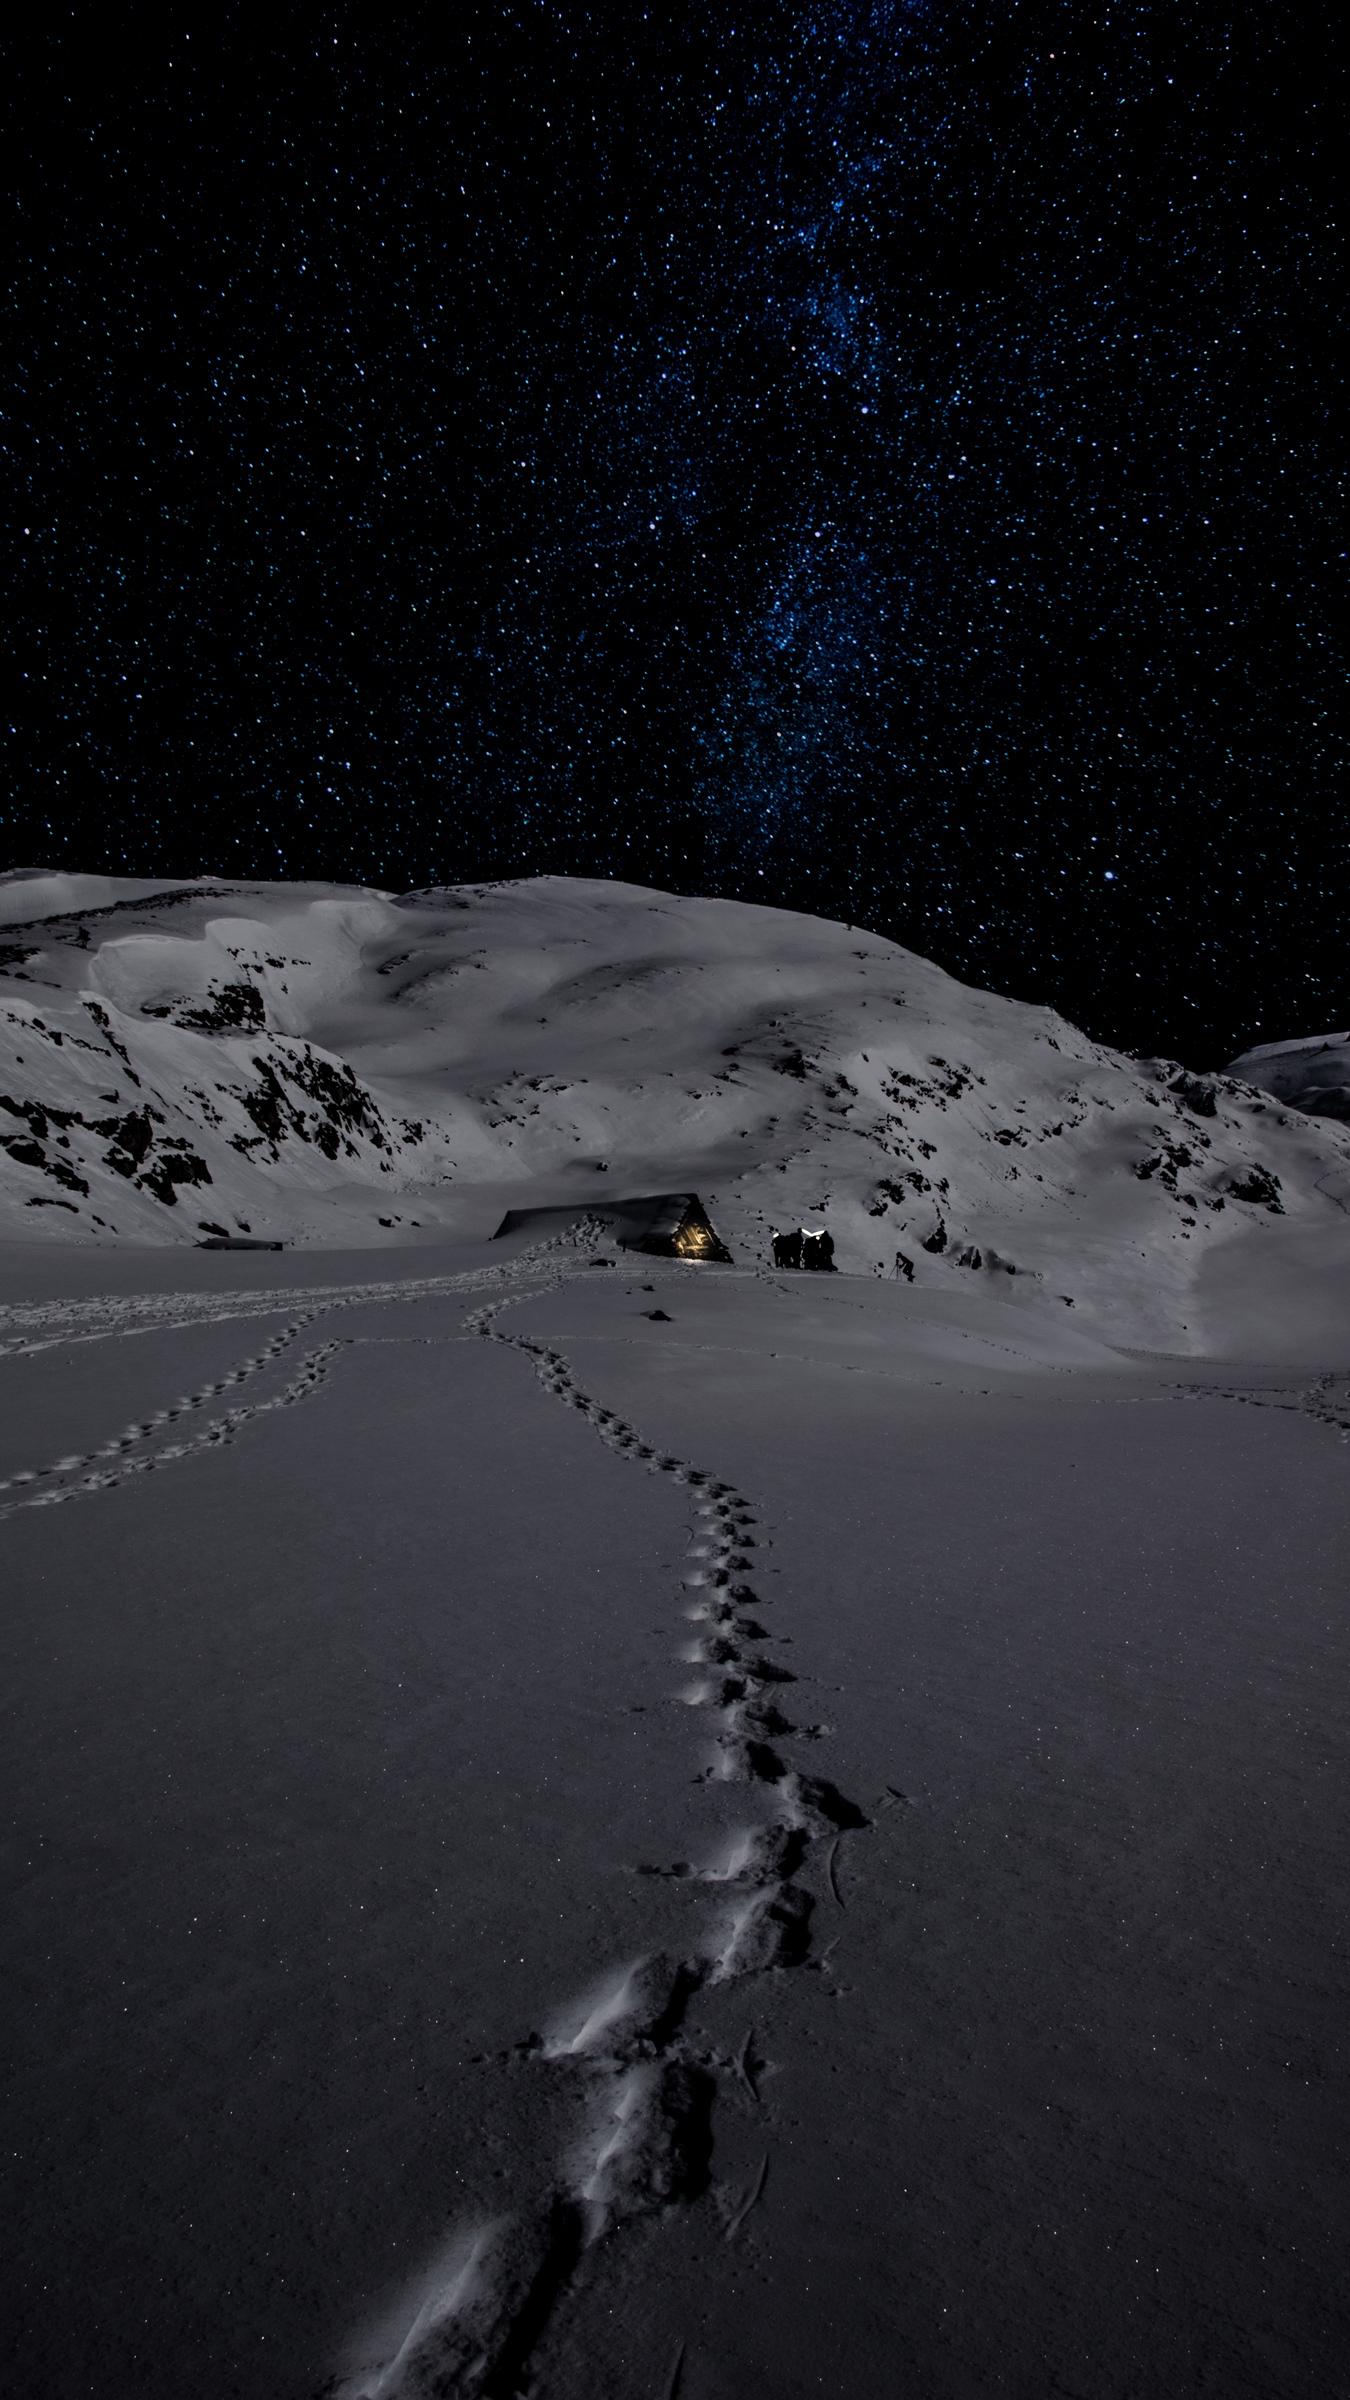 Winter Snowy Night Wallpapers ...